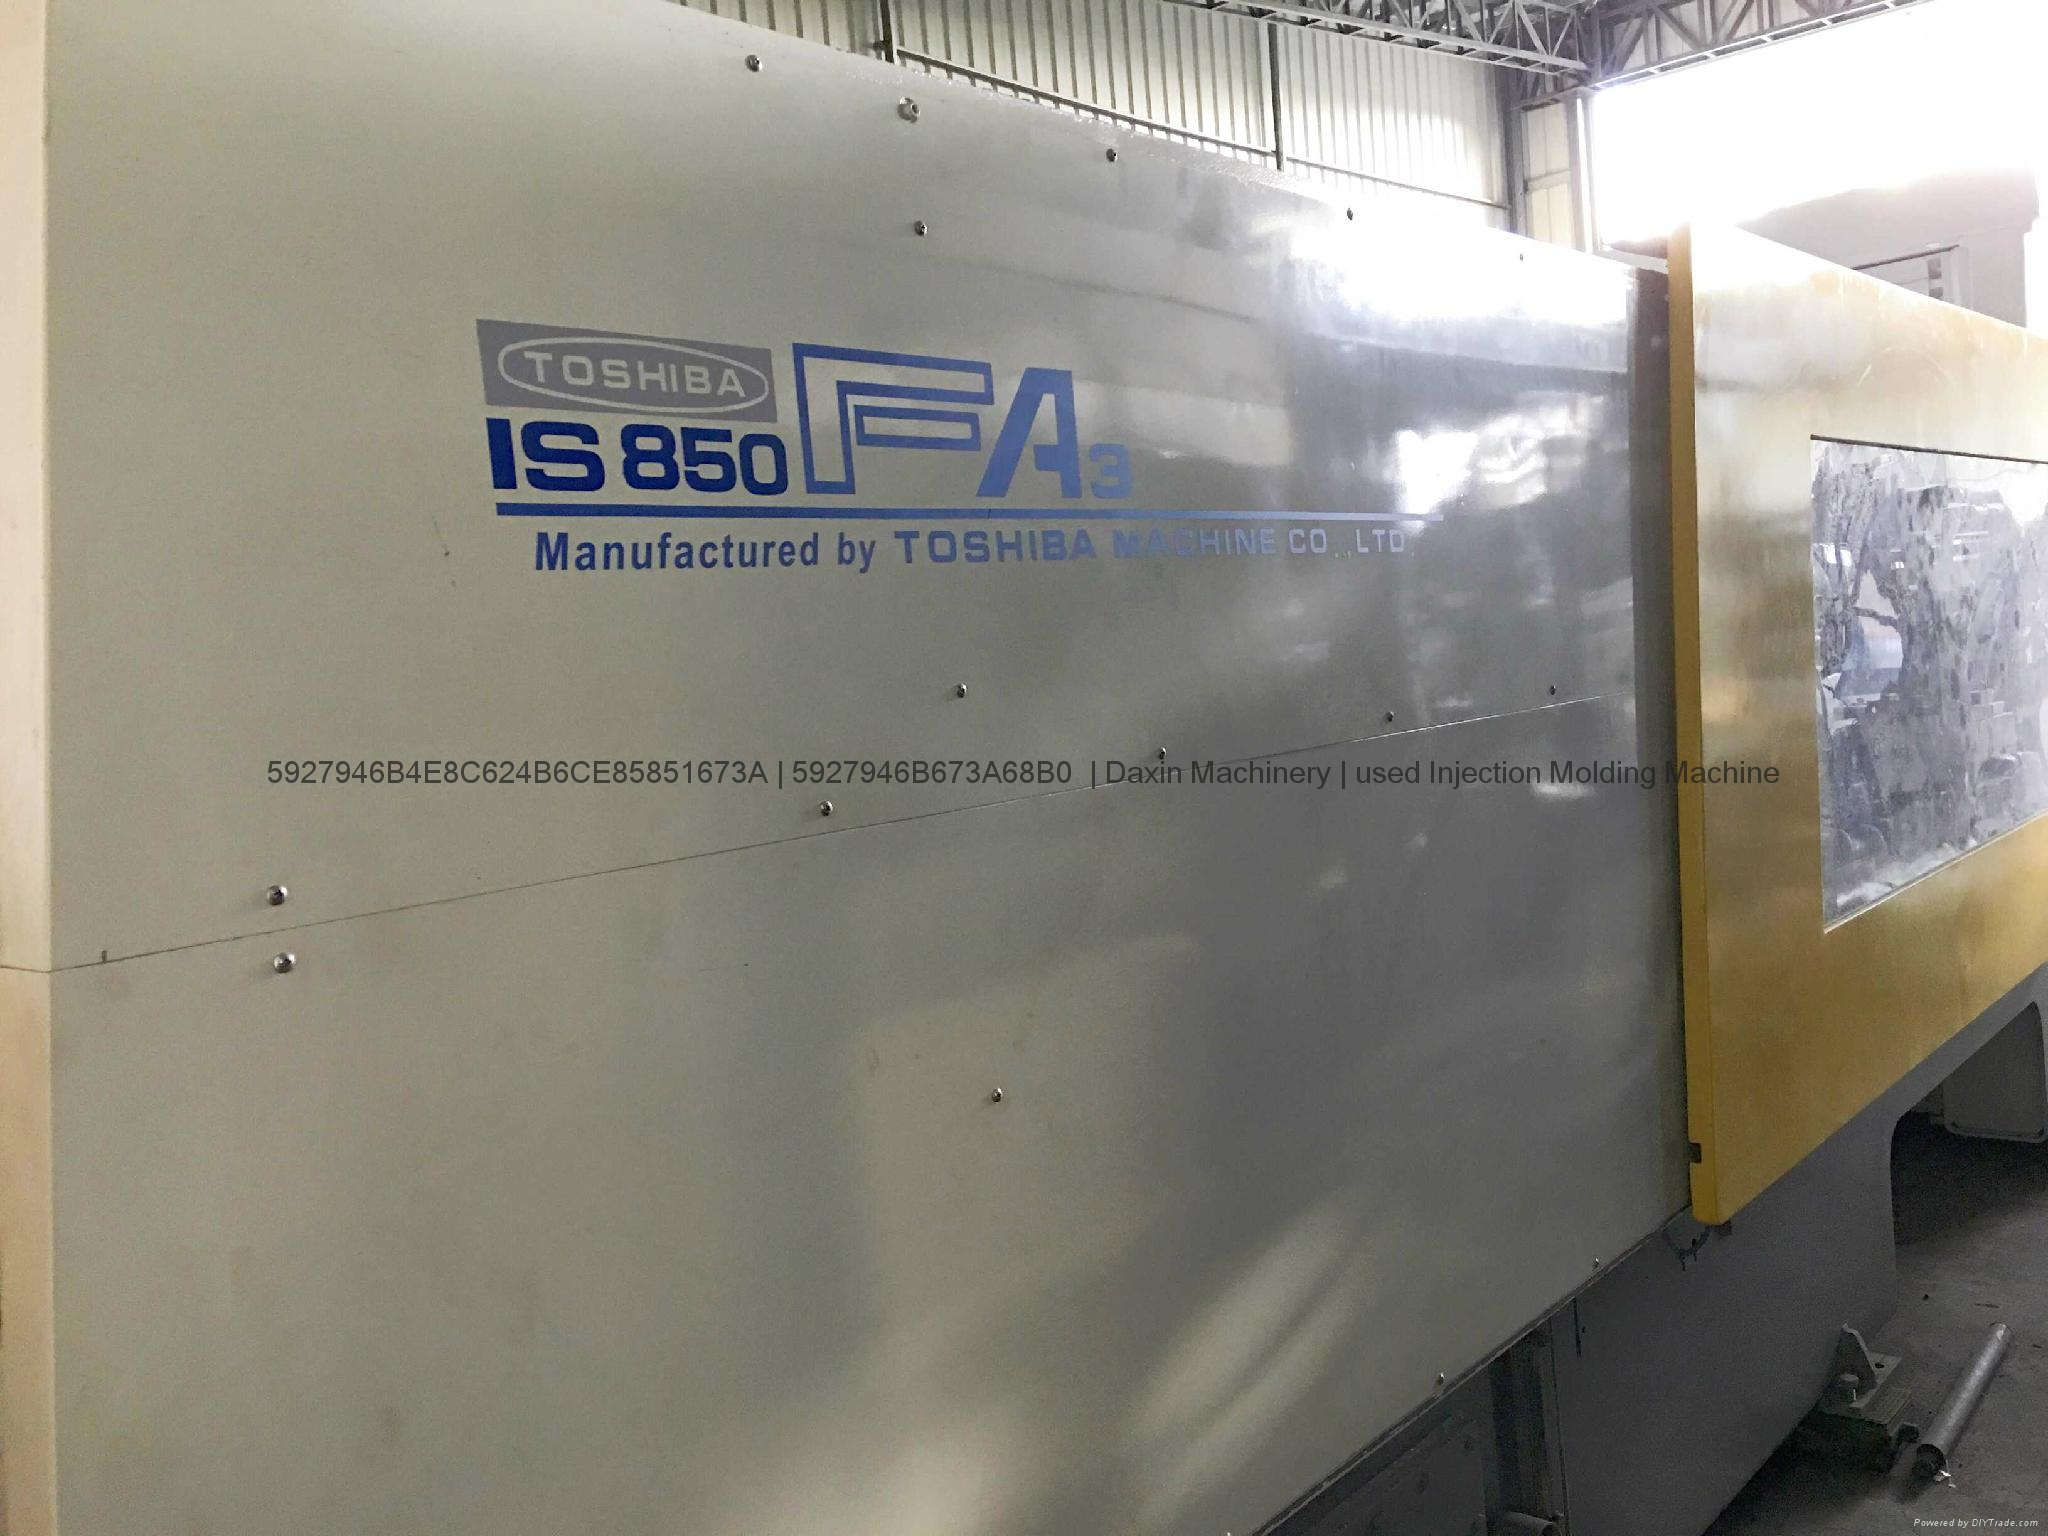 Toshiba 850t used Injection Molding Machine